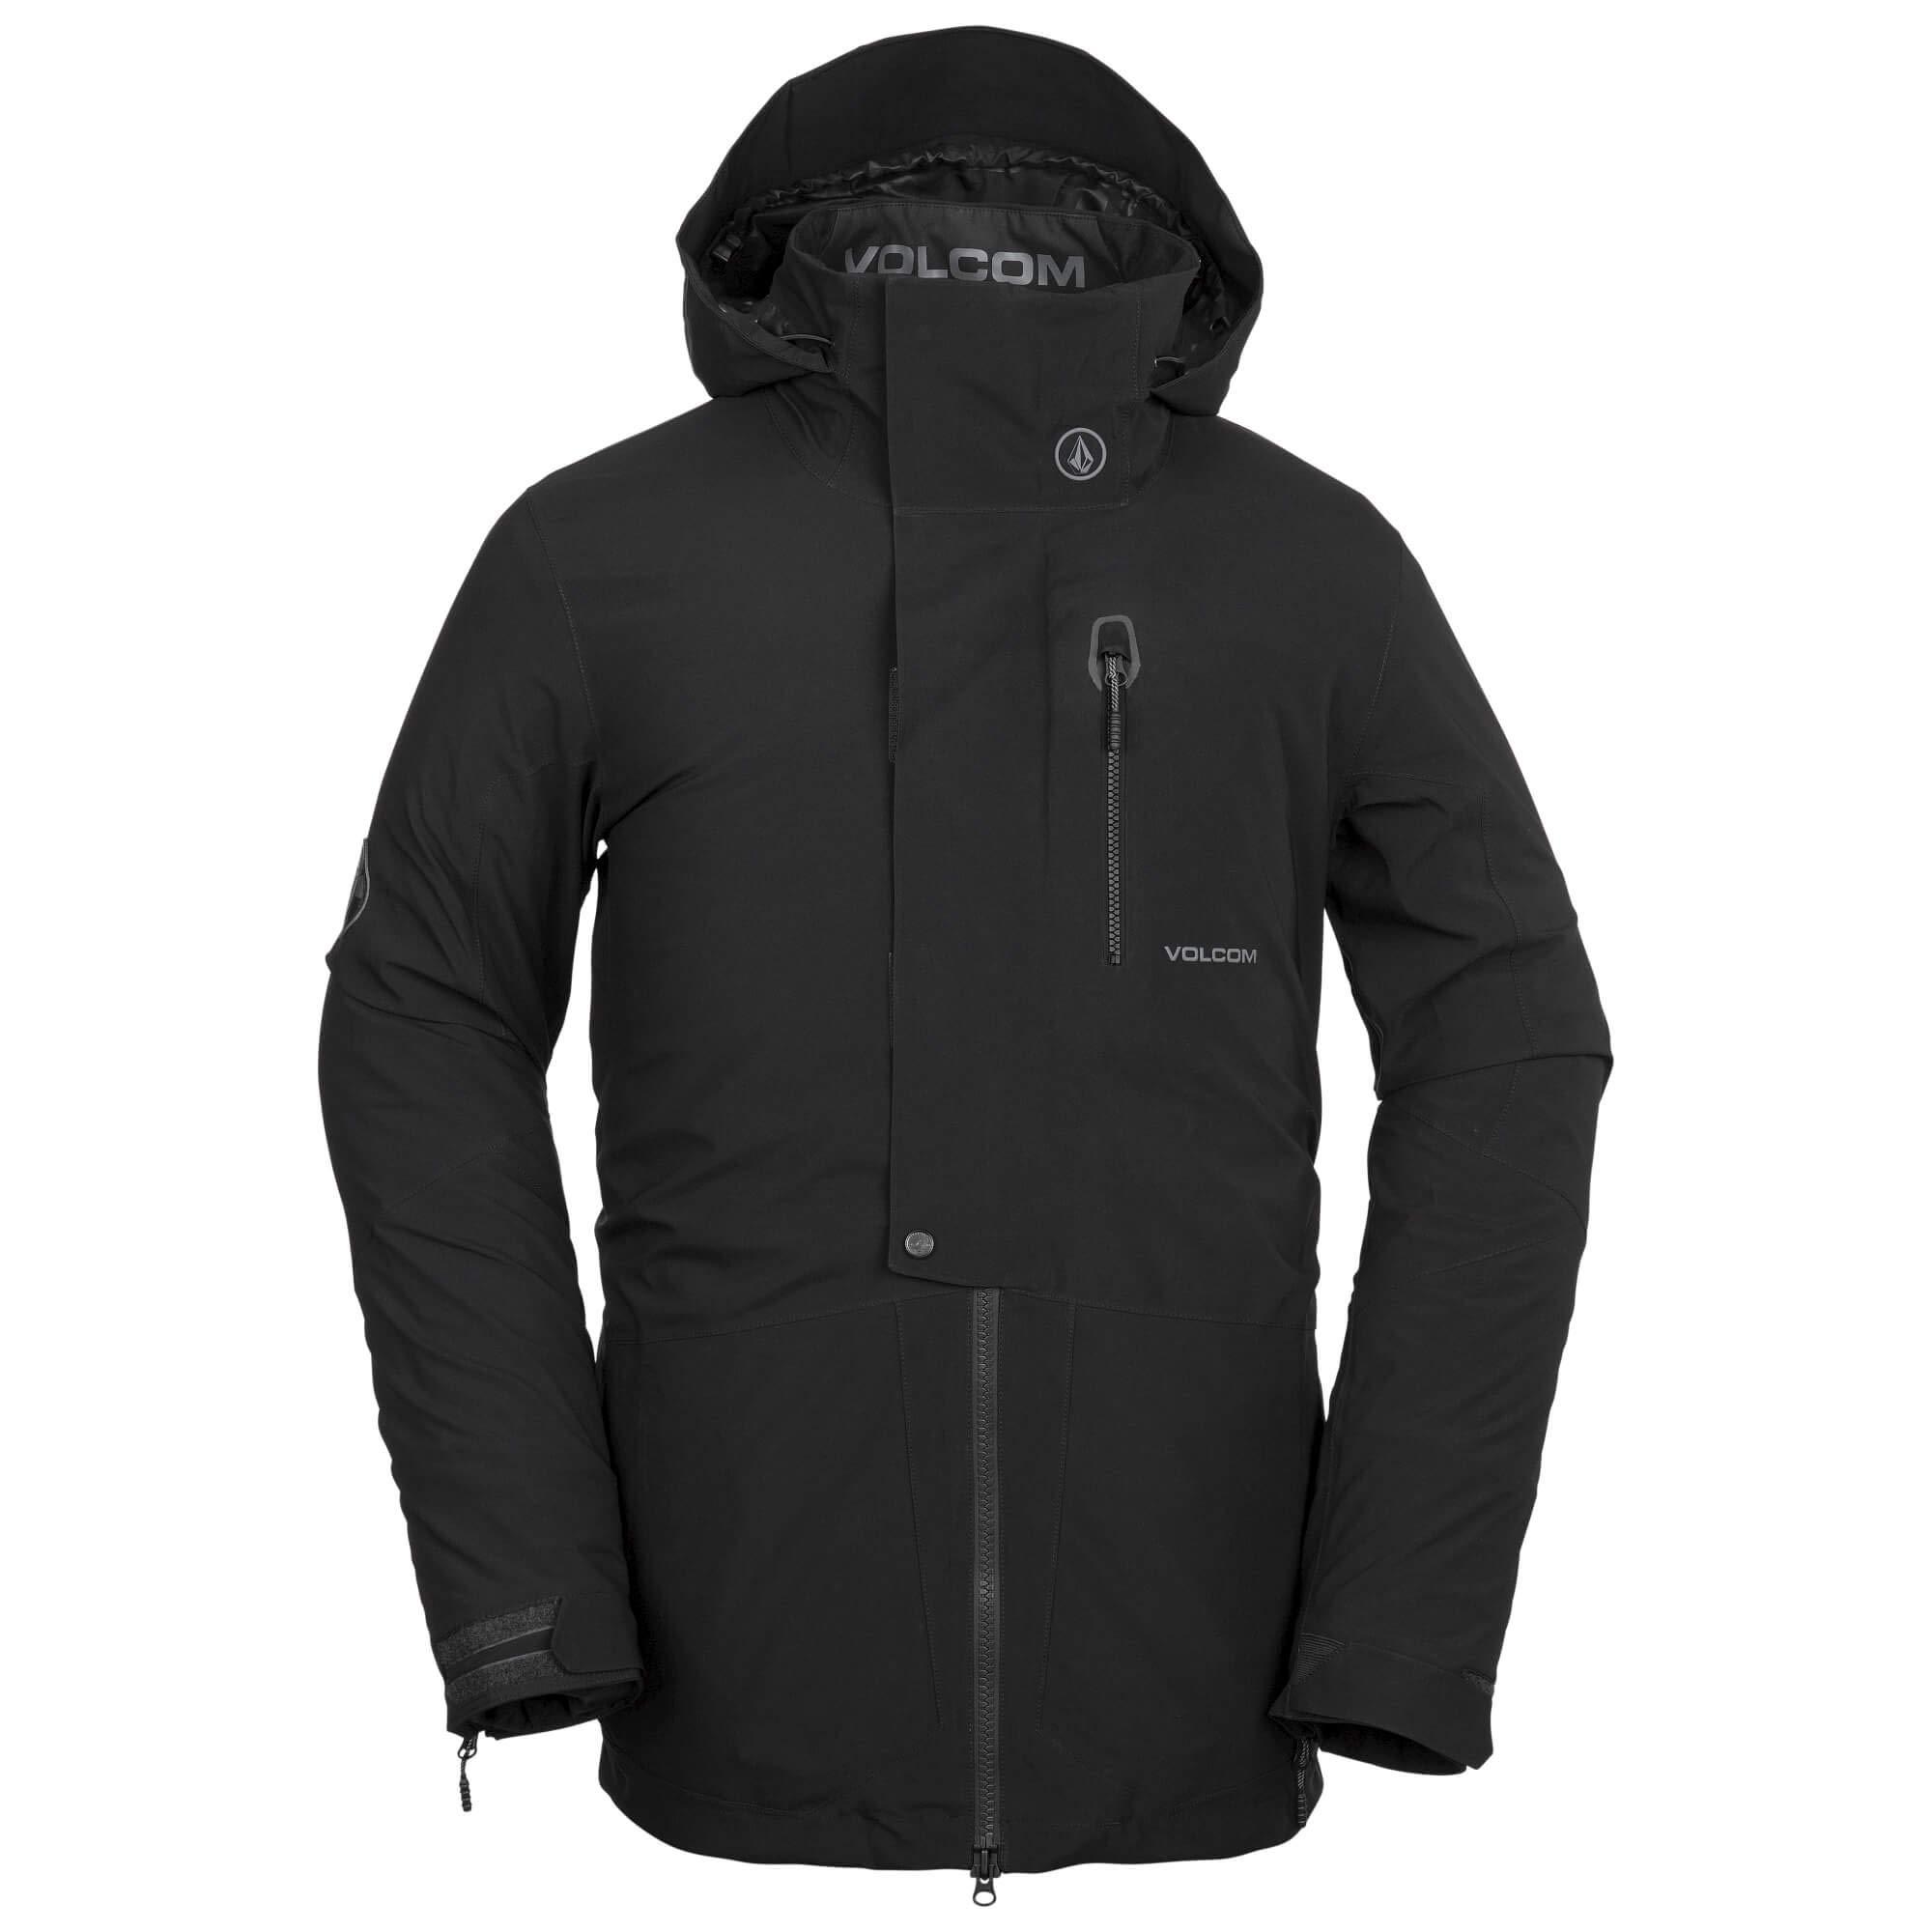 Volcom Men's BL Gore-Tex 2 Layer Stretch Snow Jacket, Black Small